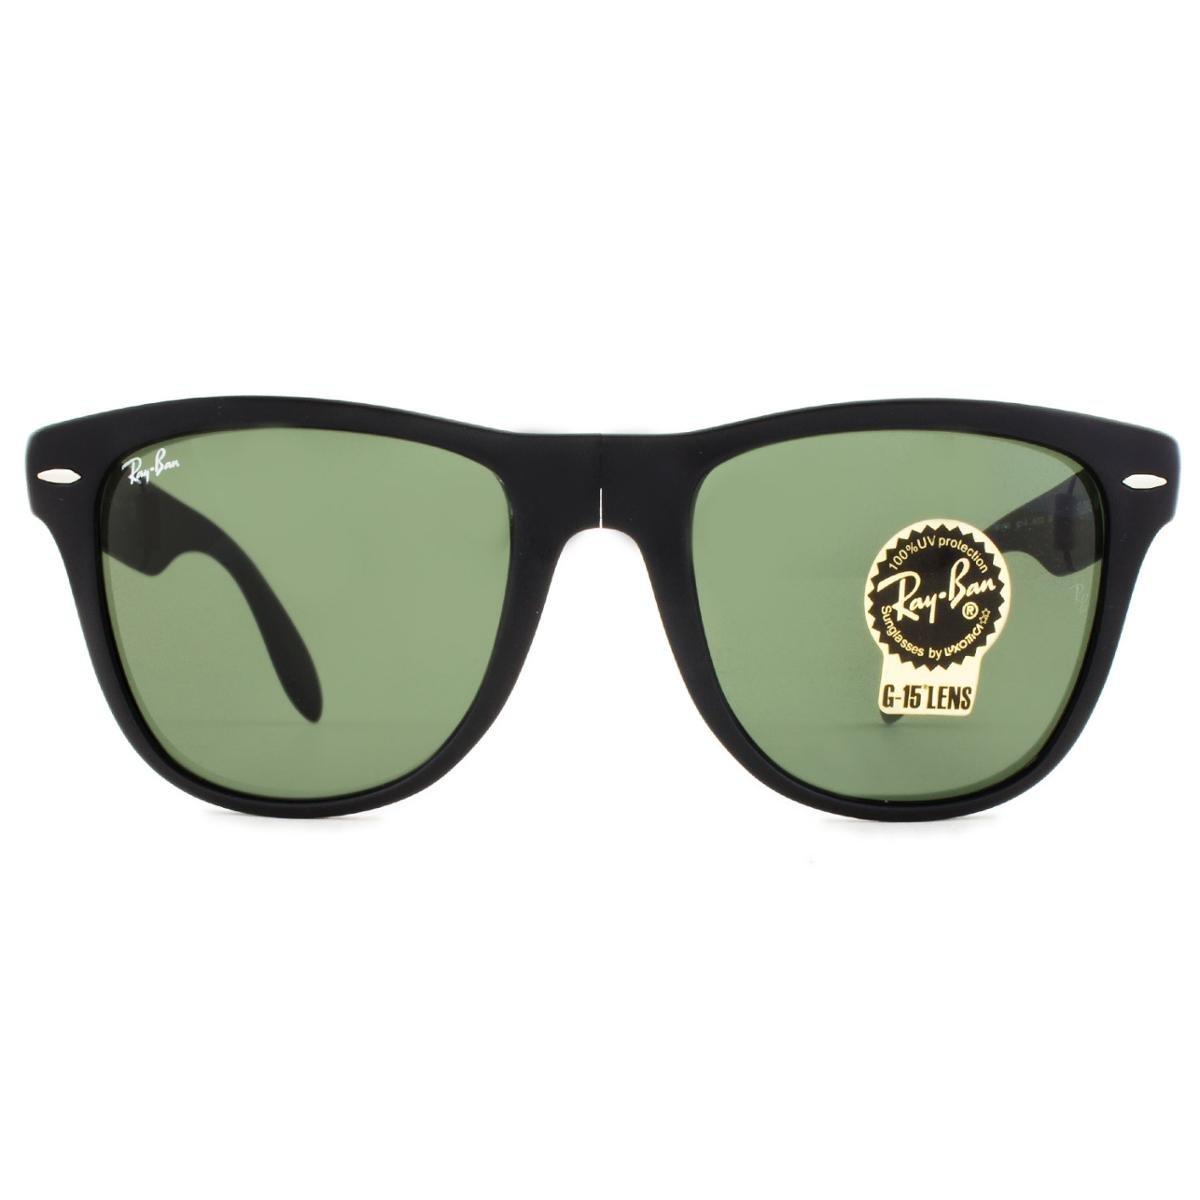 e4a8677ee Óculos Ray Ban Wayfarer Folding/Dobrável RB4105 601S-54 | Netshoes